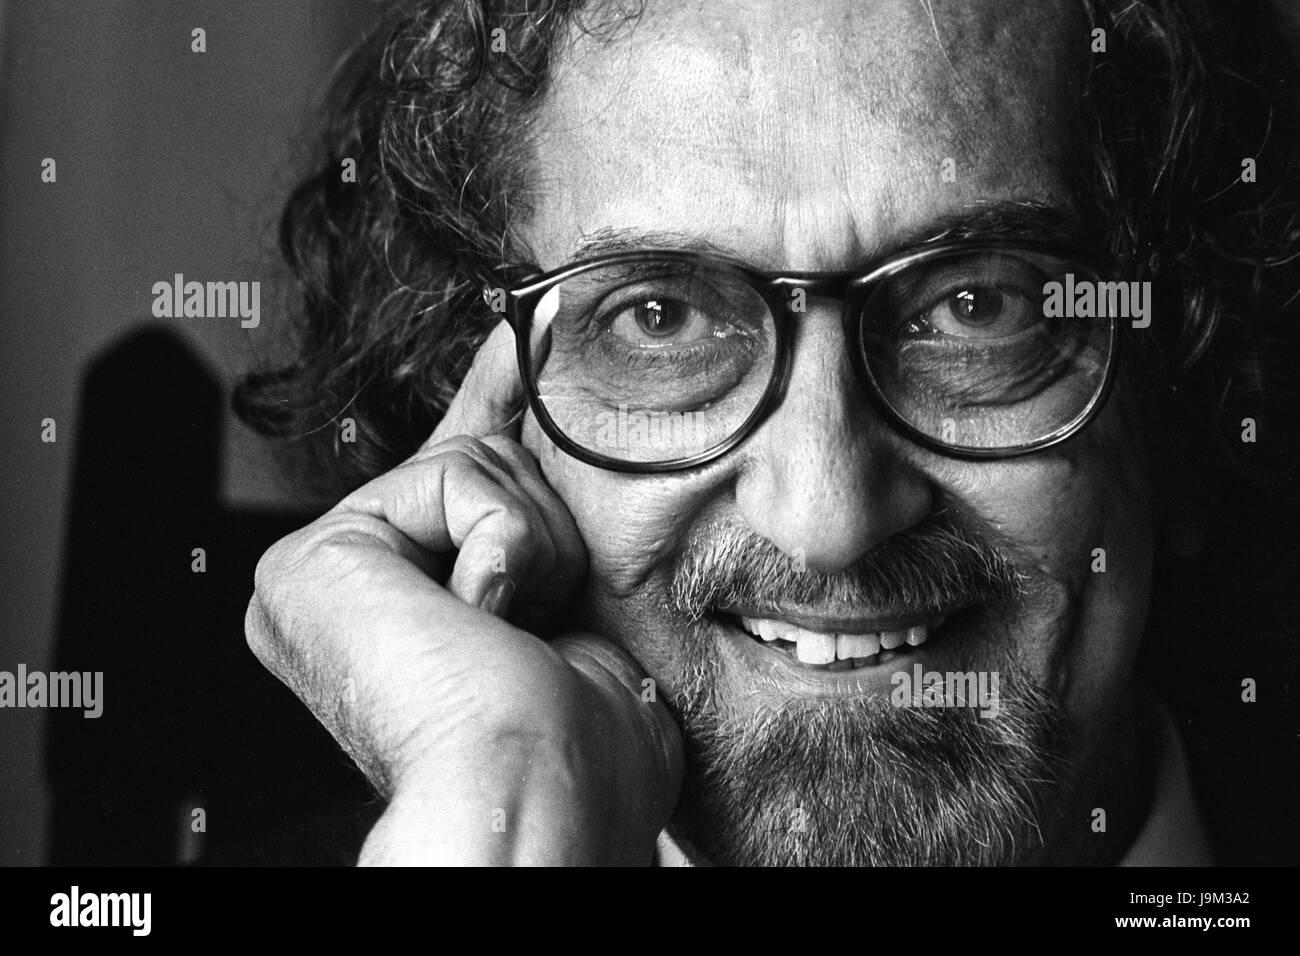 Alyque Padamsee, Indian ad film maker, India, Asia - Stock Image